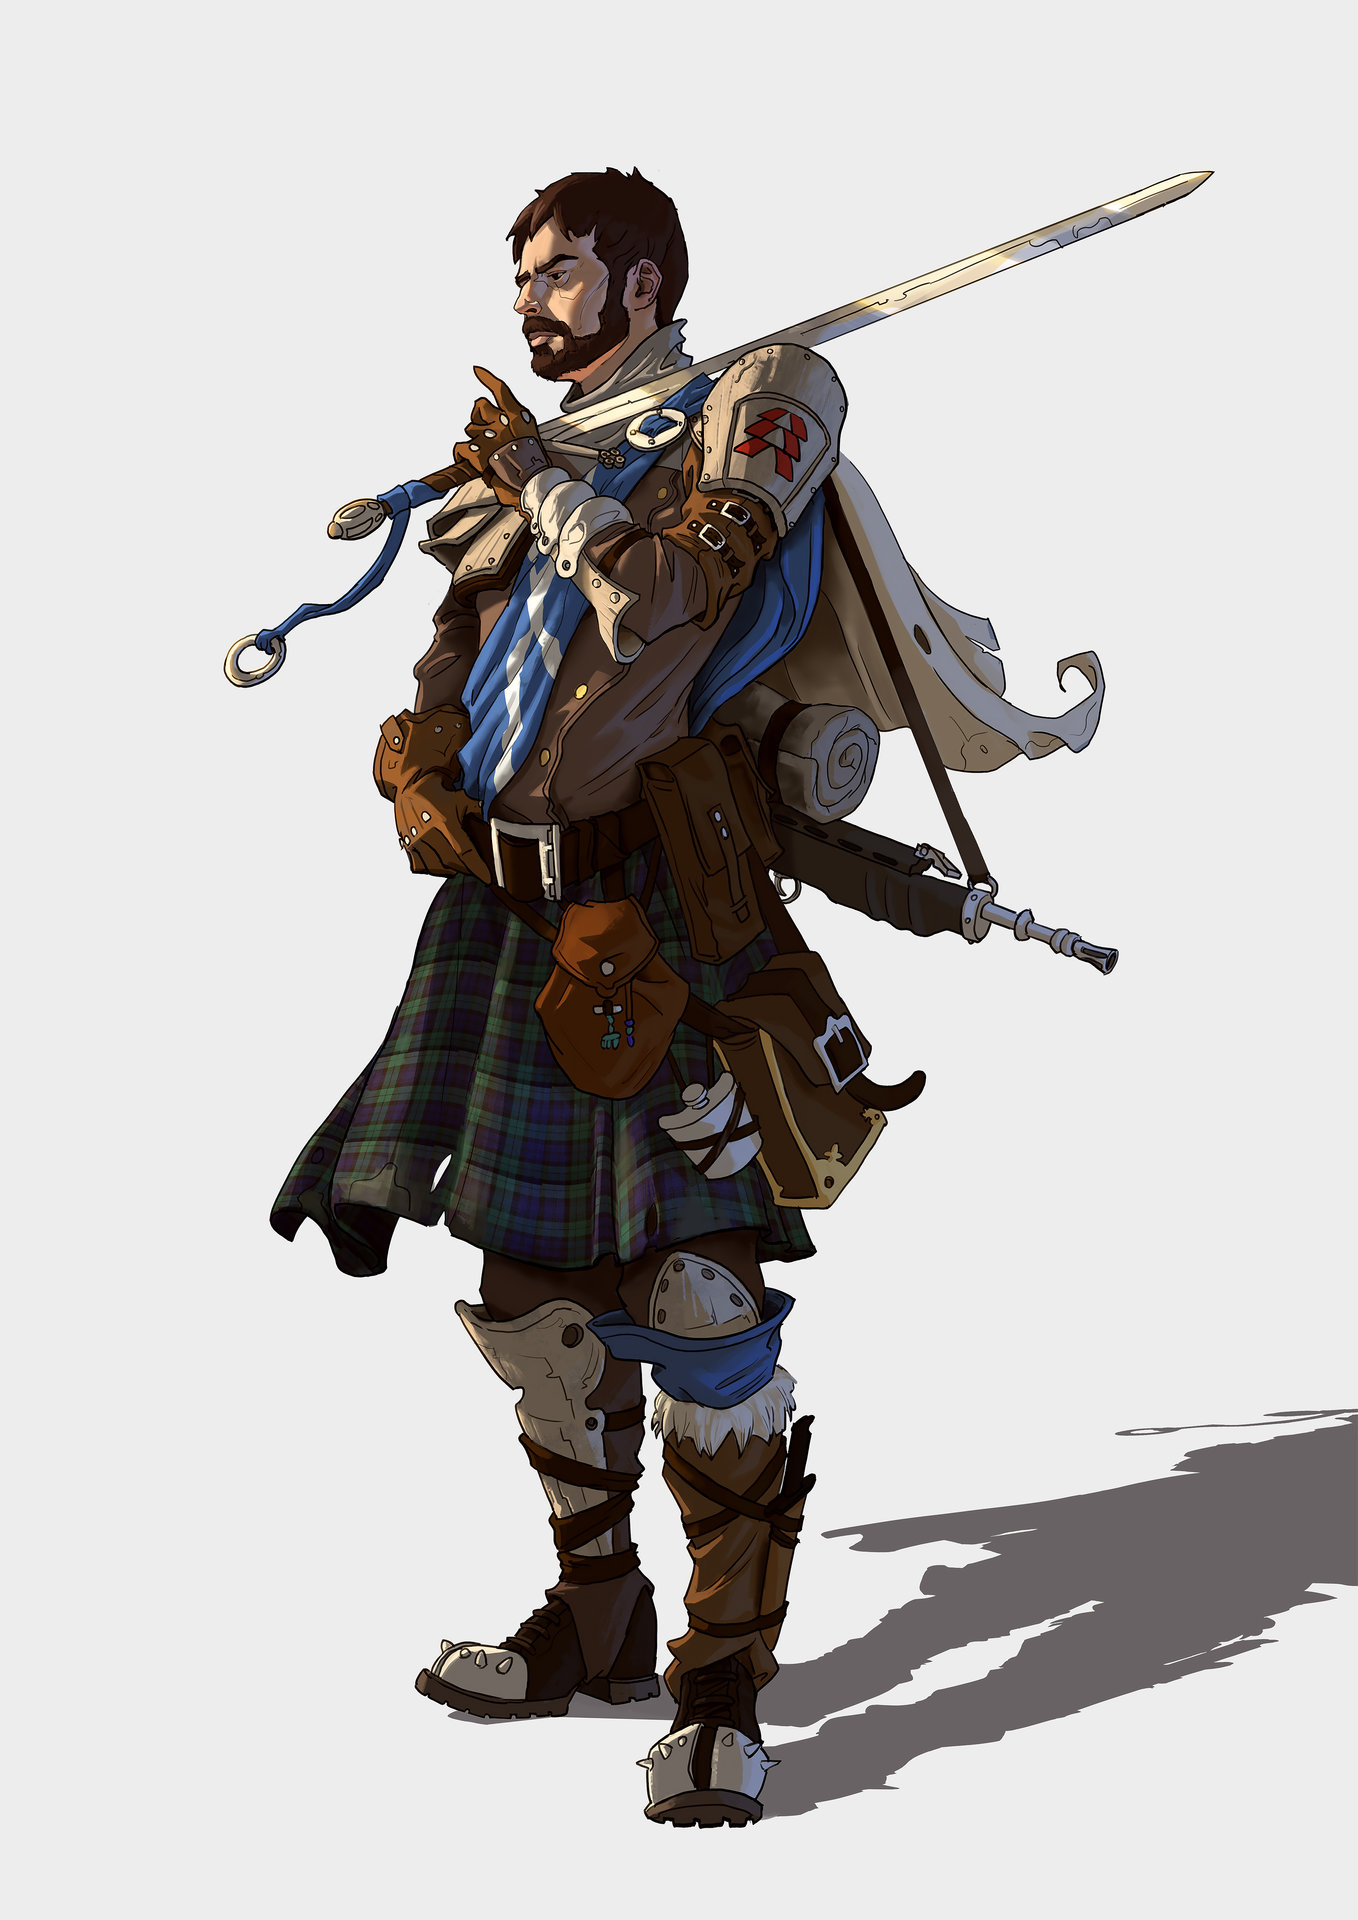 ArtStation - Daniel the post-apocalyptic Highlander